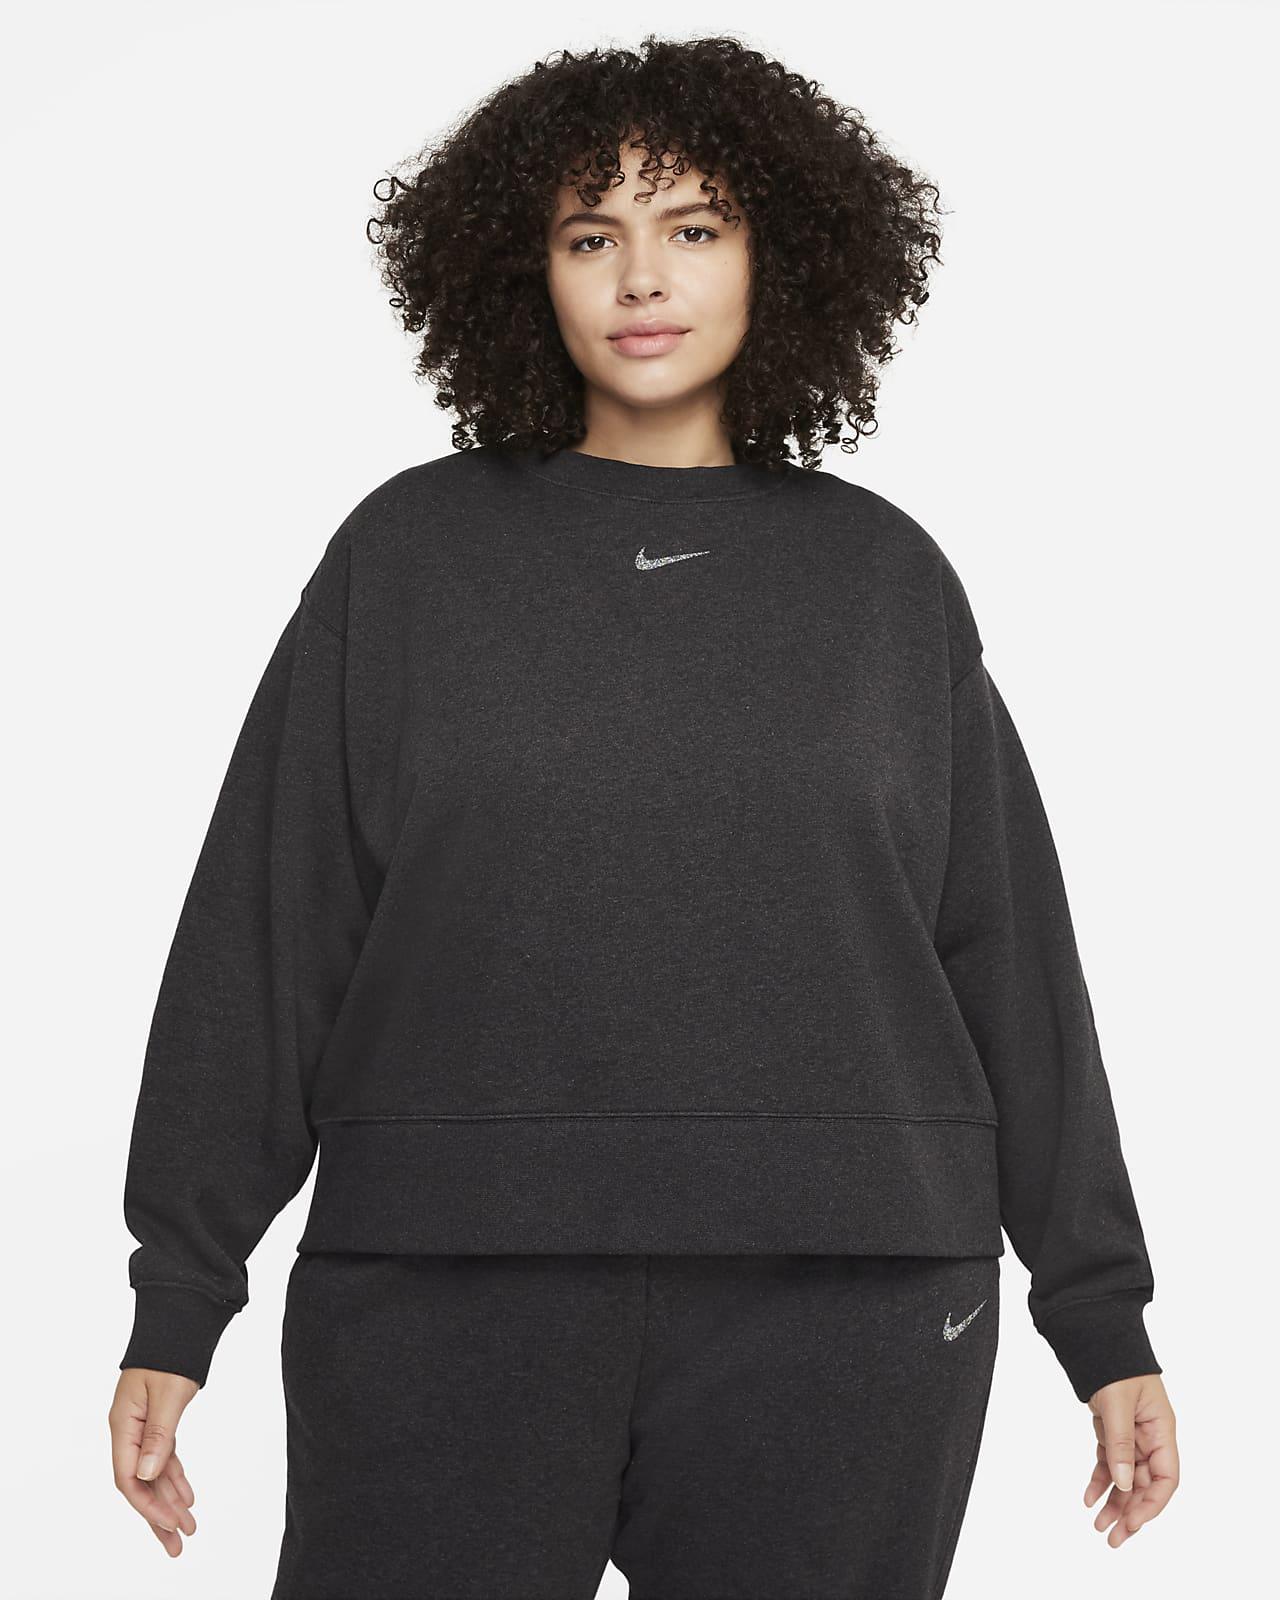 Maglia a girocollo oversize in fleece Nike Sportswear Collection Essentials (Plus size) - Donna